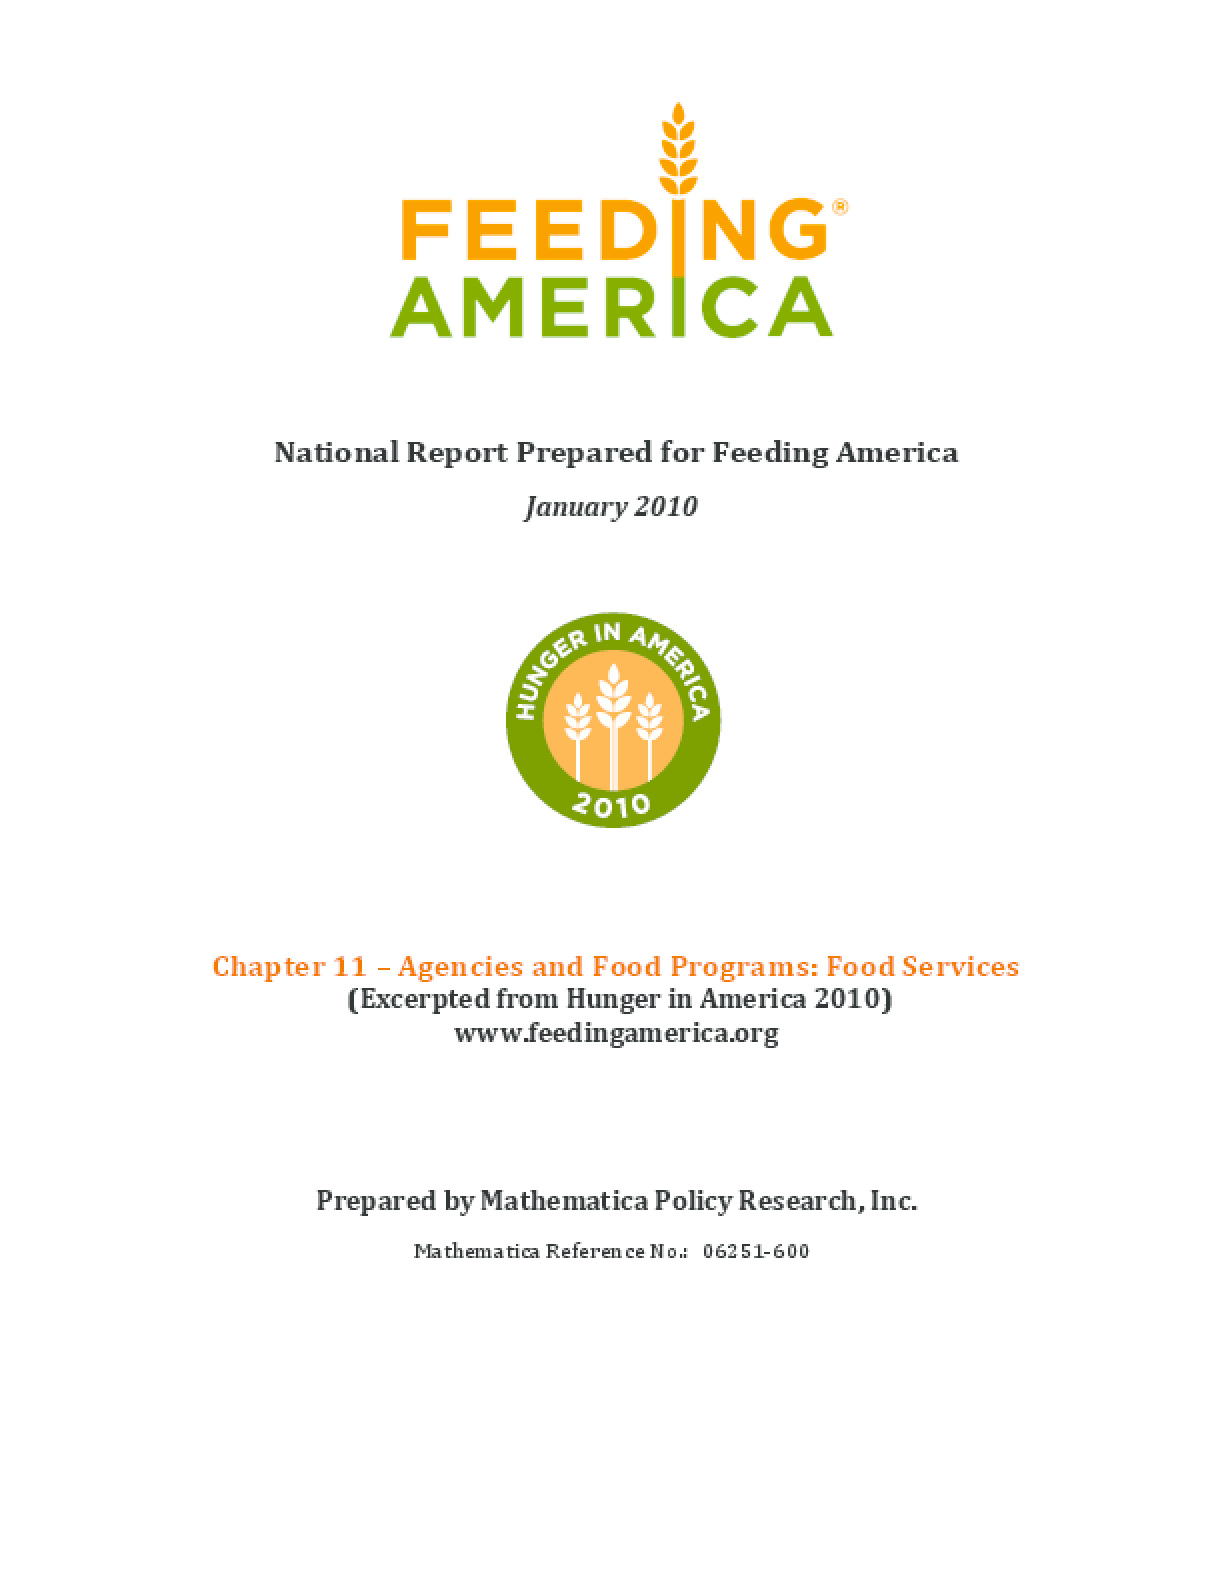 Feeding America Agencies and Food Programs: Food Service Operations